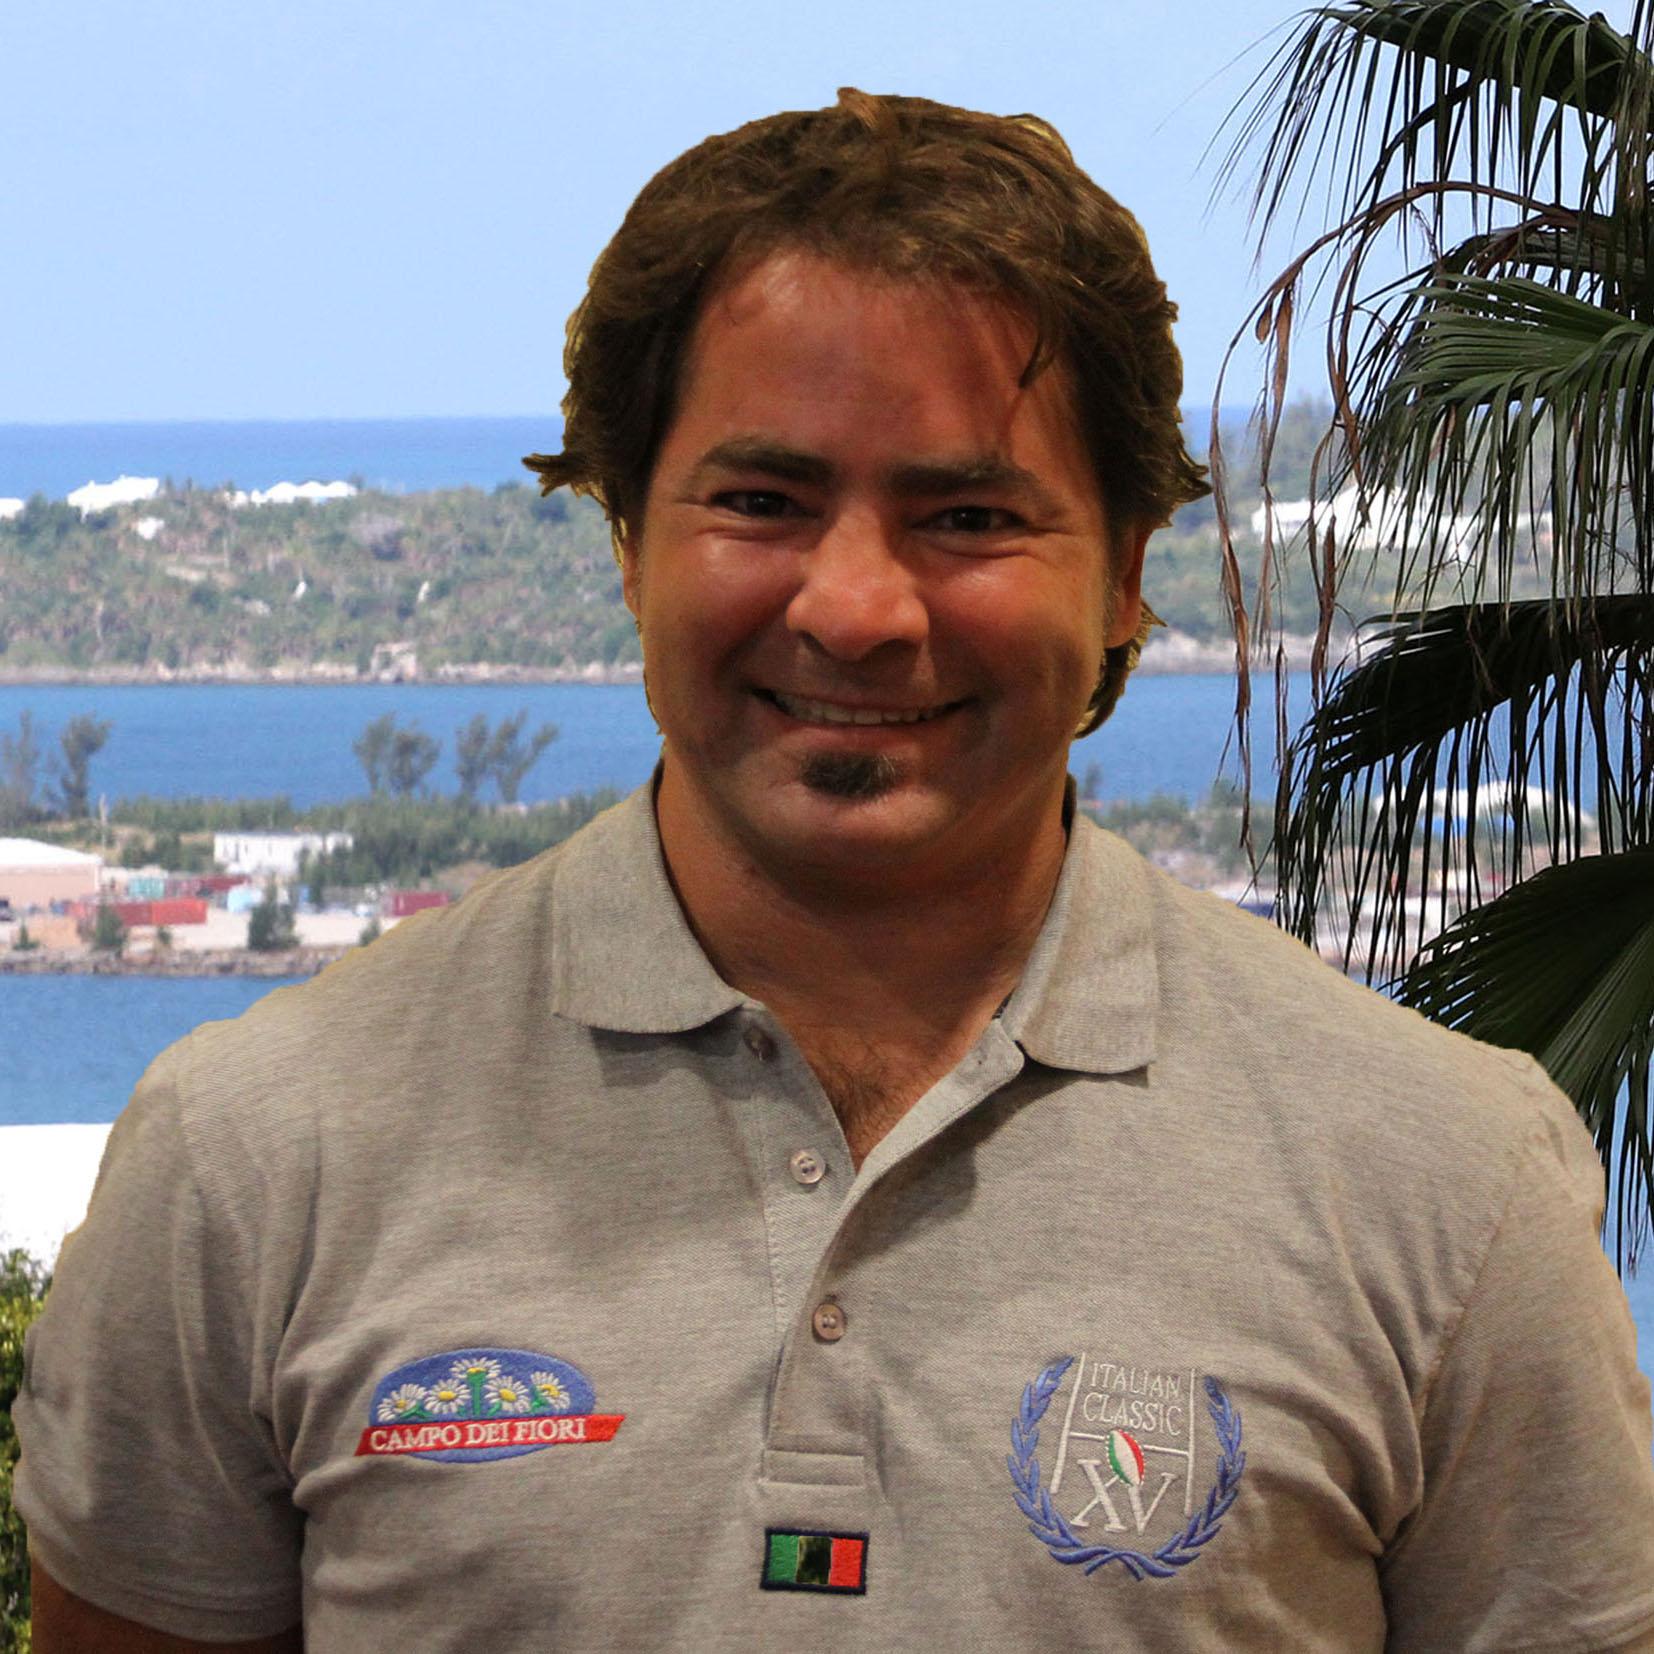 https://www.rugbyitalianclassicxv.com/wp-content/uploads/2019/04/WorldClassic2018_Bermuda_20181104_00_Villagra_ph_Turchetto.jpg